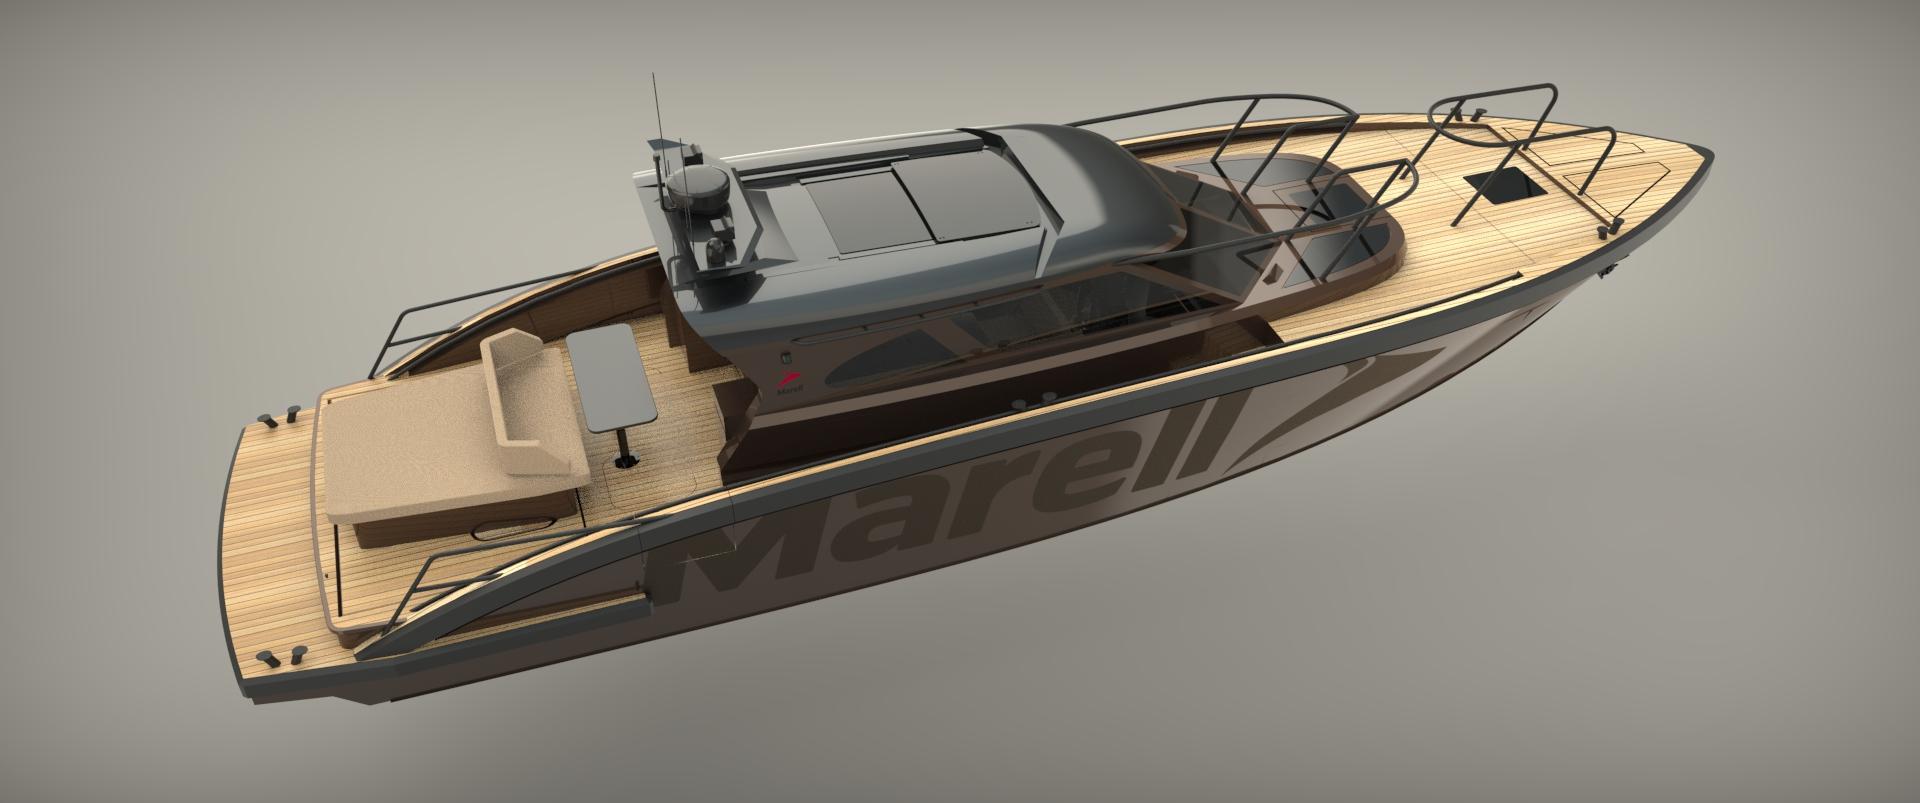 M15 custom rendered boat model